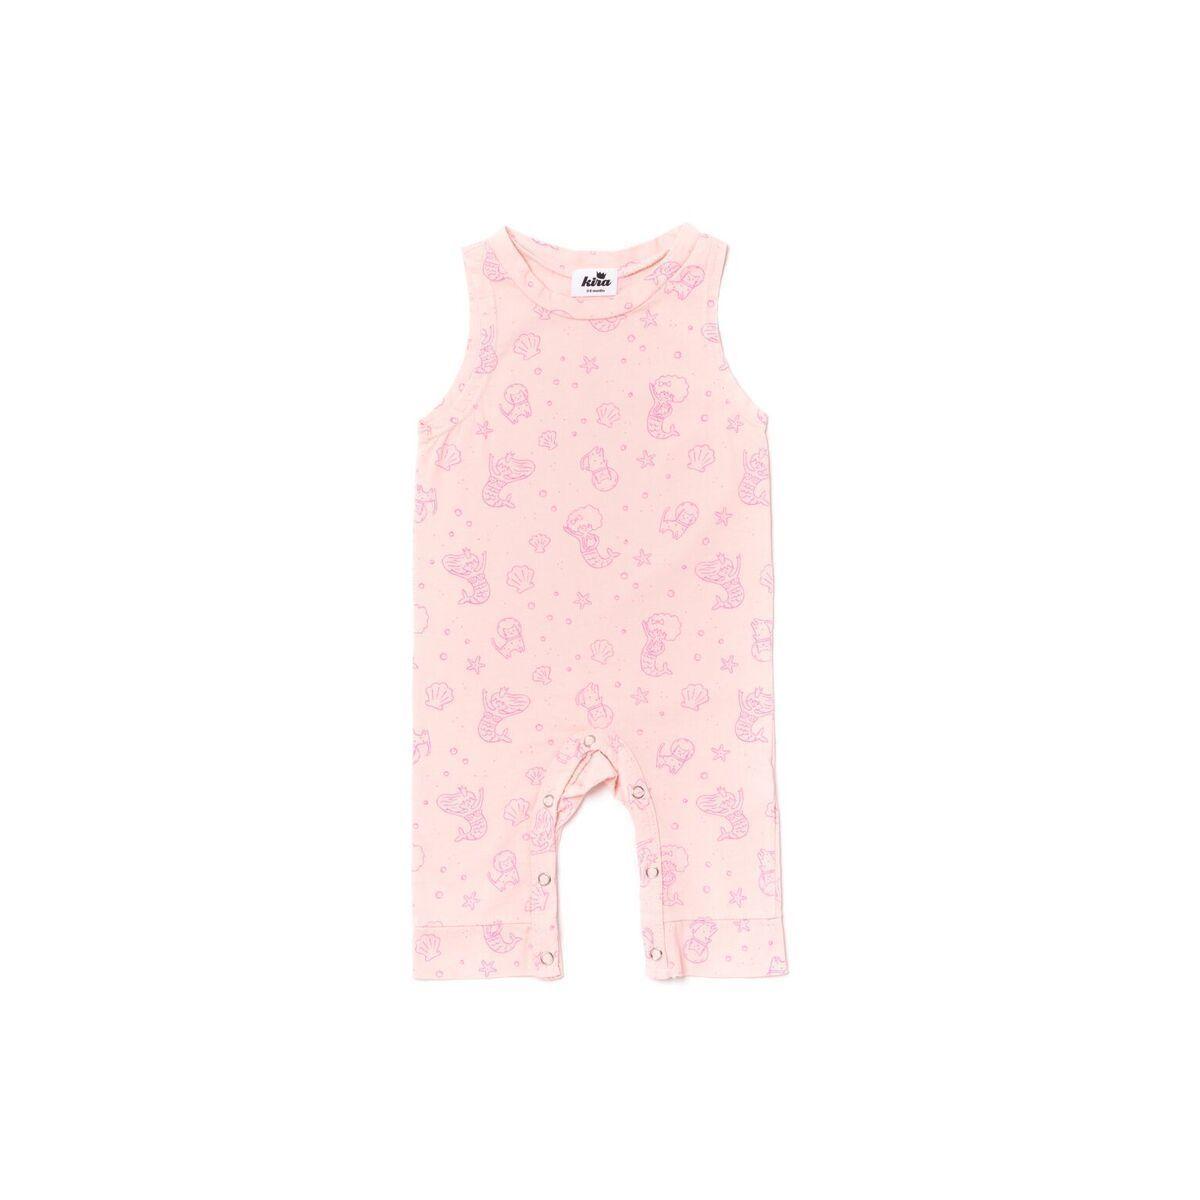 dbf2e0212df0 Kira Kids Mermaid Sleeveless Jumpsuit - Powder Pink 100% organic cotton  Light pink sleeveless jumpsuit with hot pink mermaid print Children s